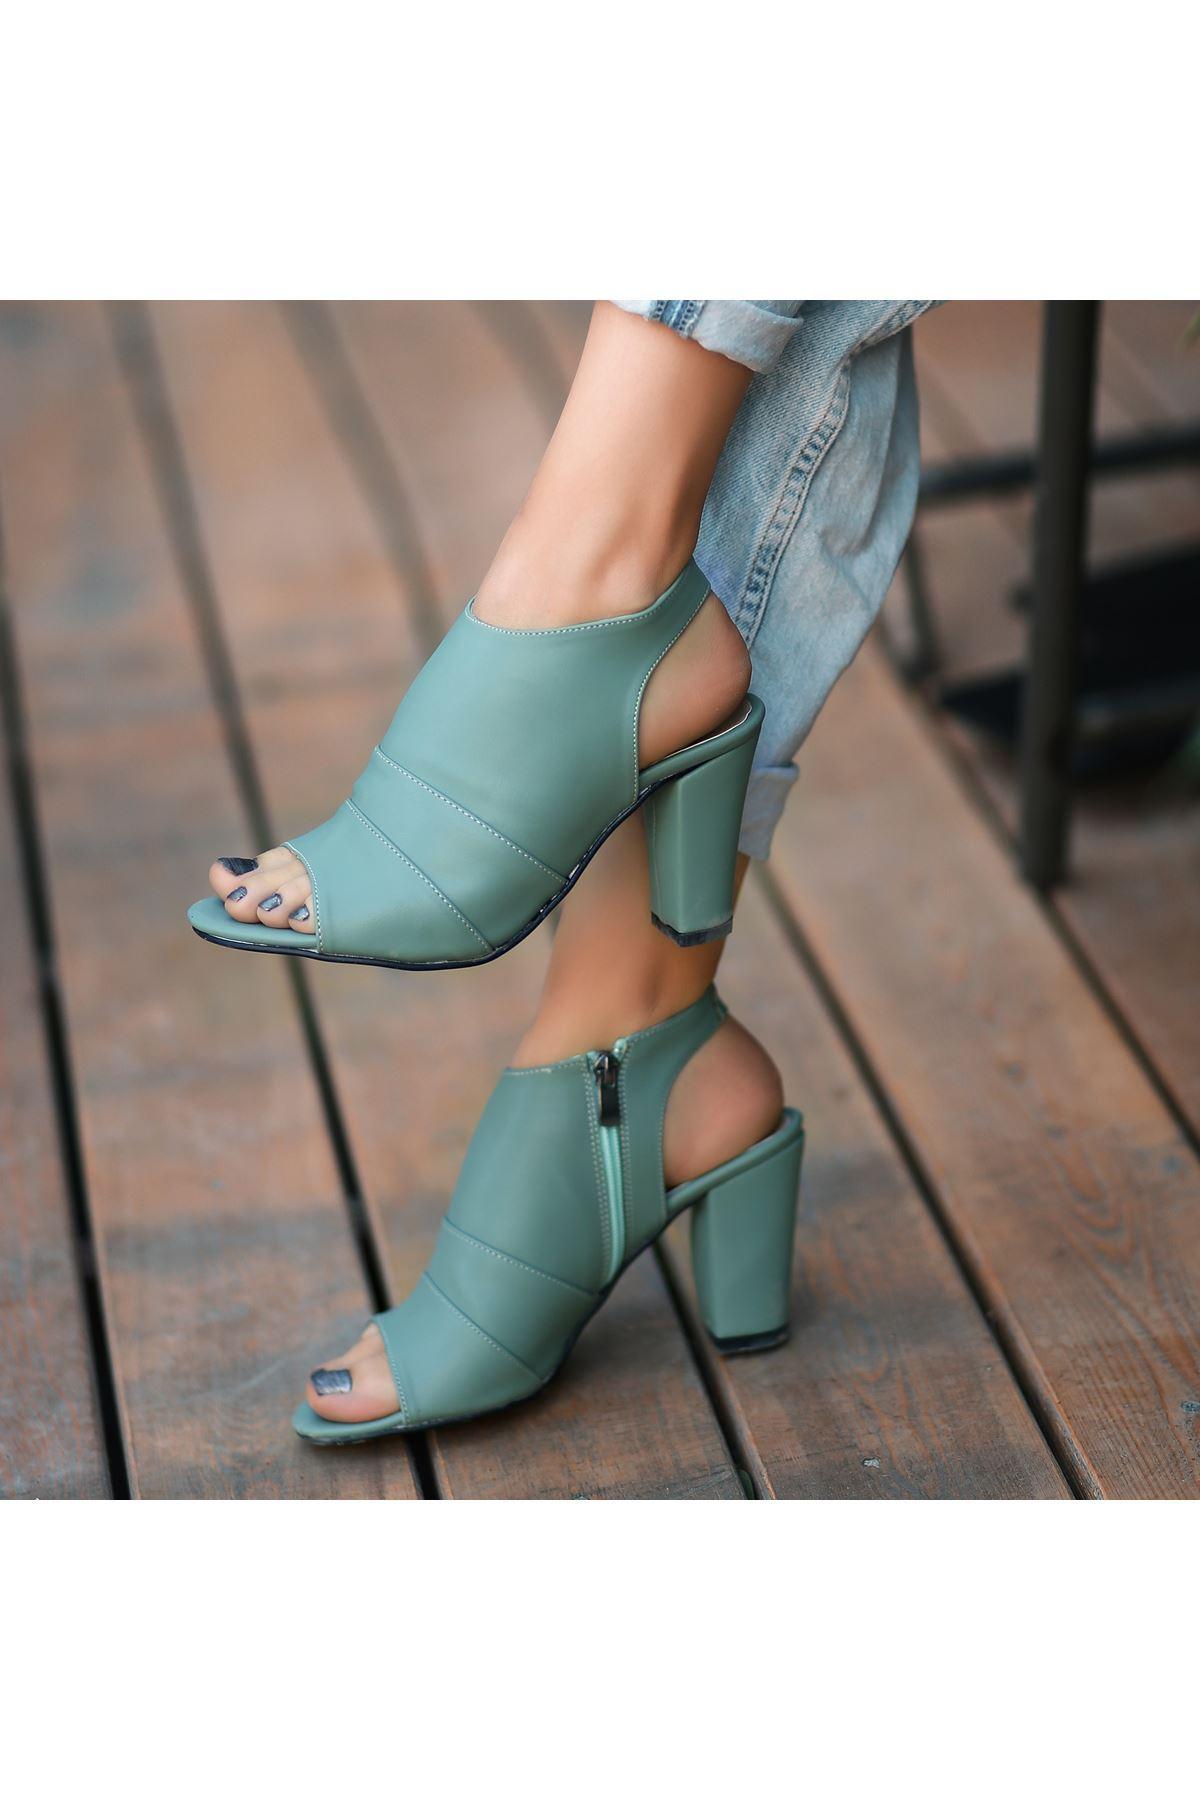 Dolly Mint Yeşili Topuklu Ayakkabı